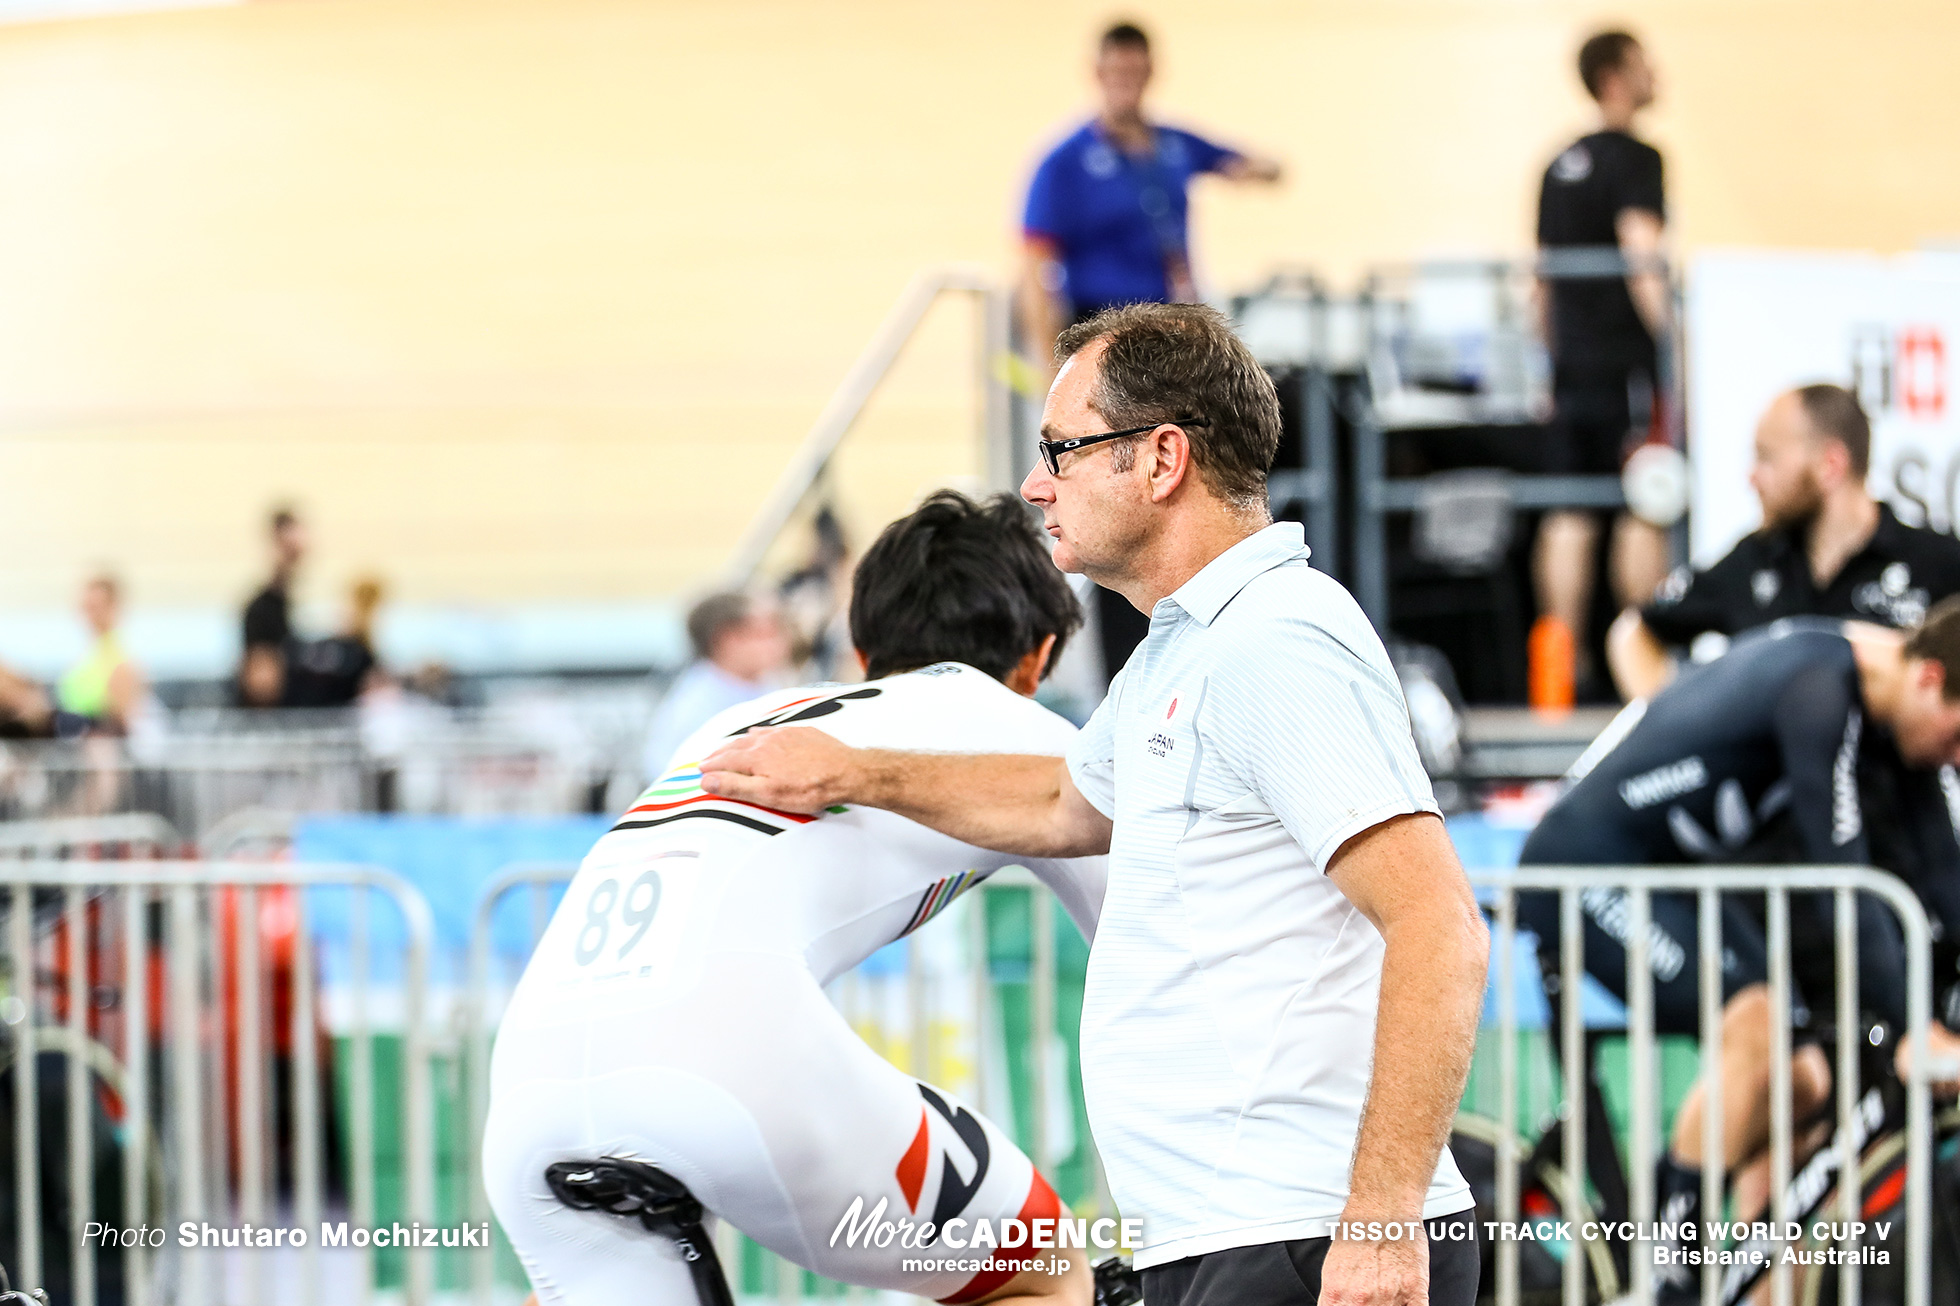 Qualifying / Men's Team Pursuit / TISSOT UCI TRACK CYCLING WORLD CUP V, Brisbane, Australia